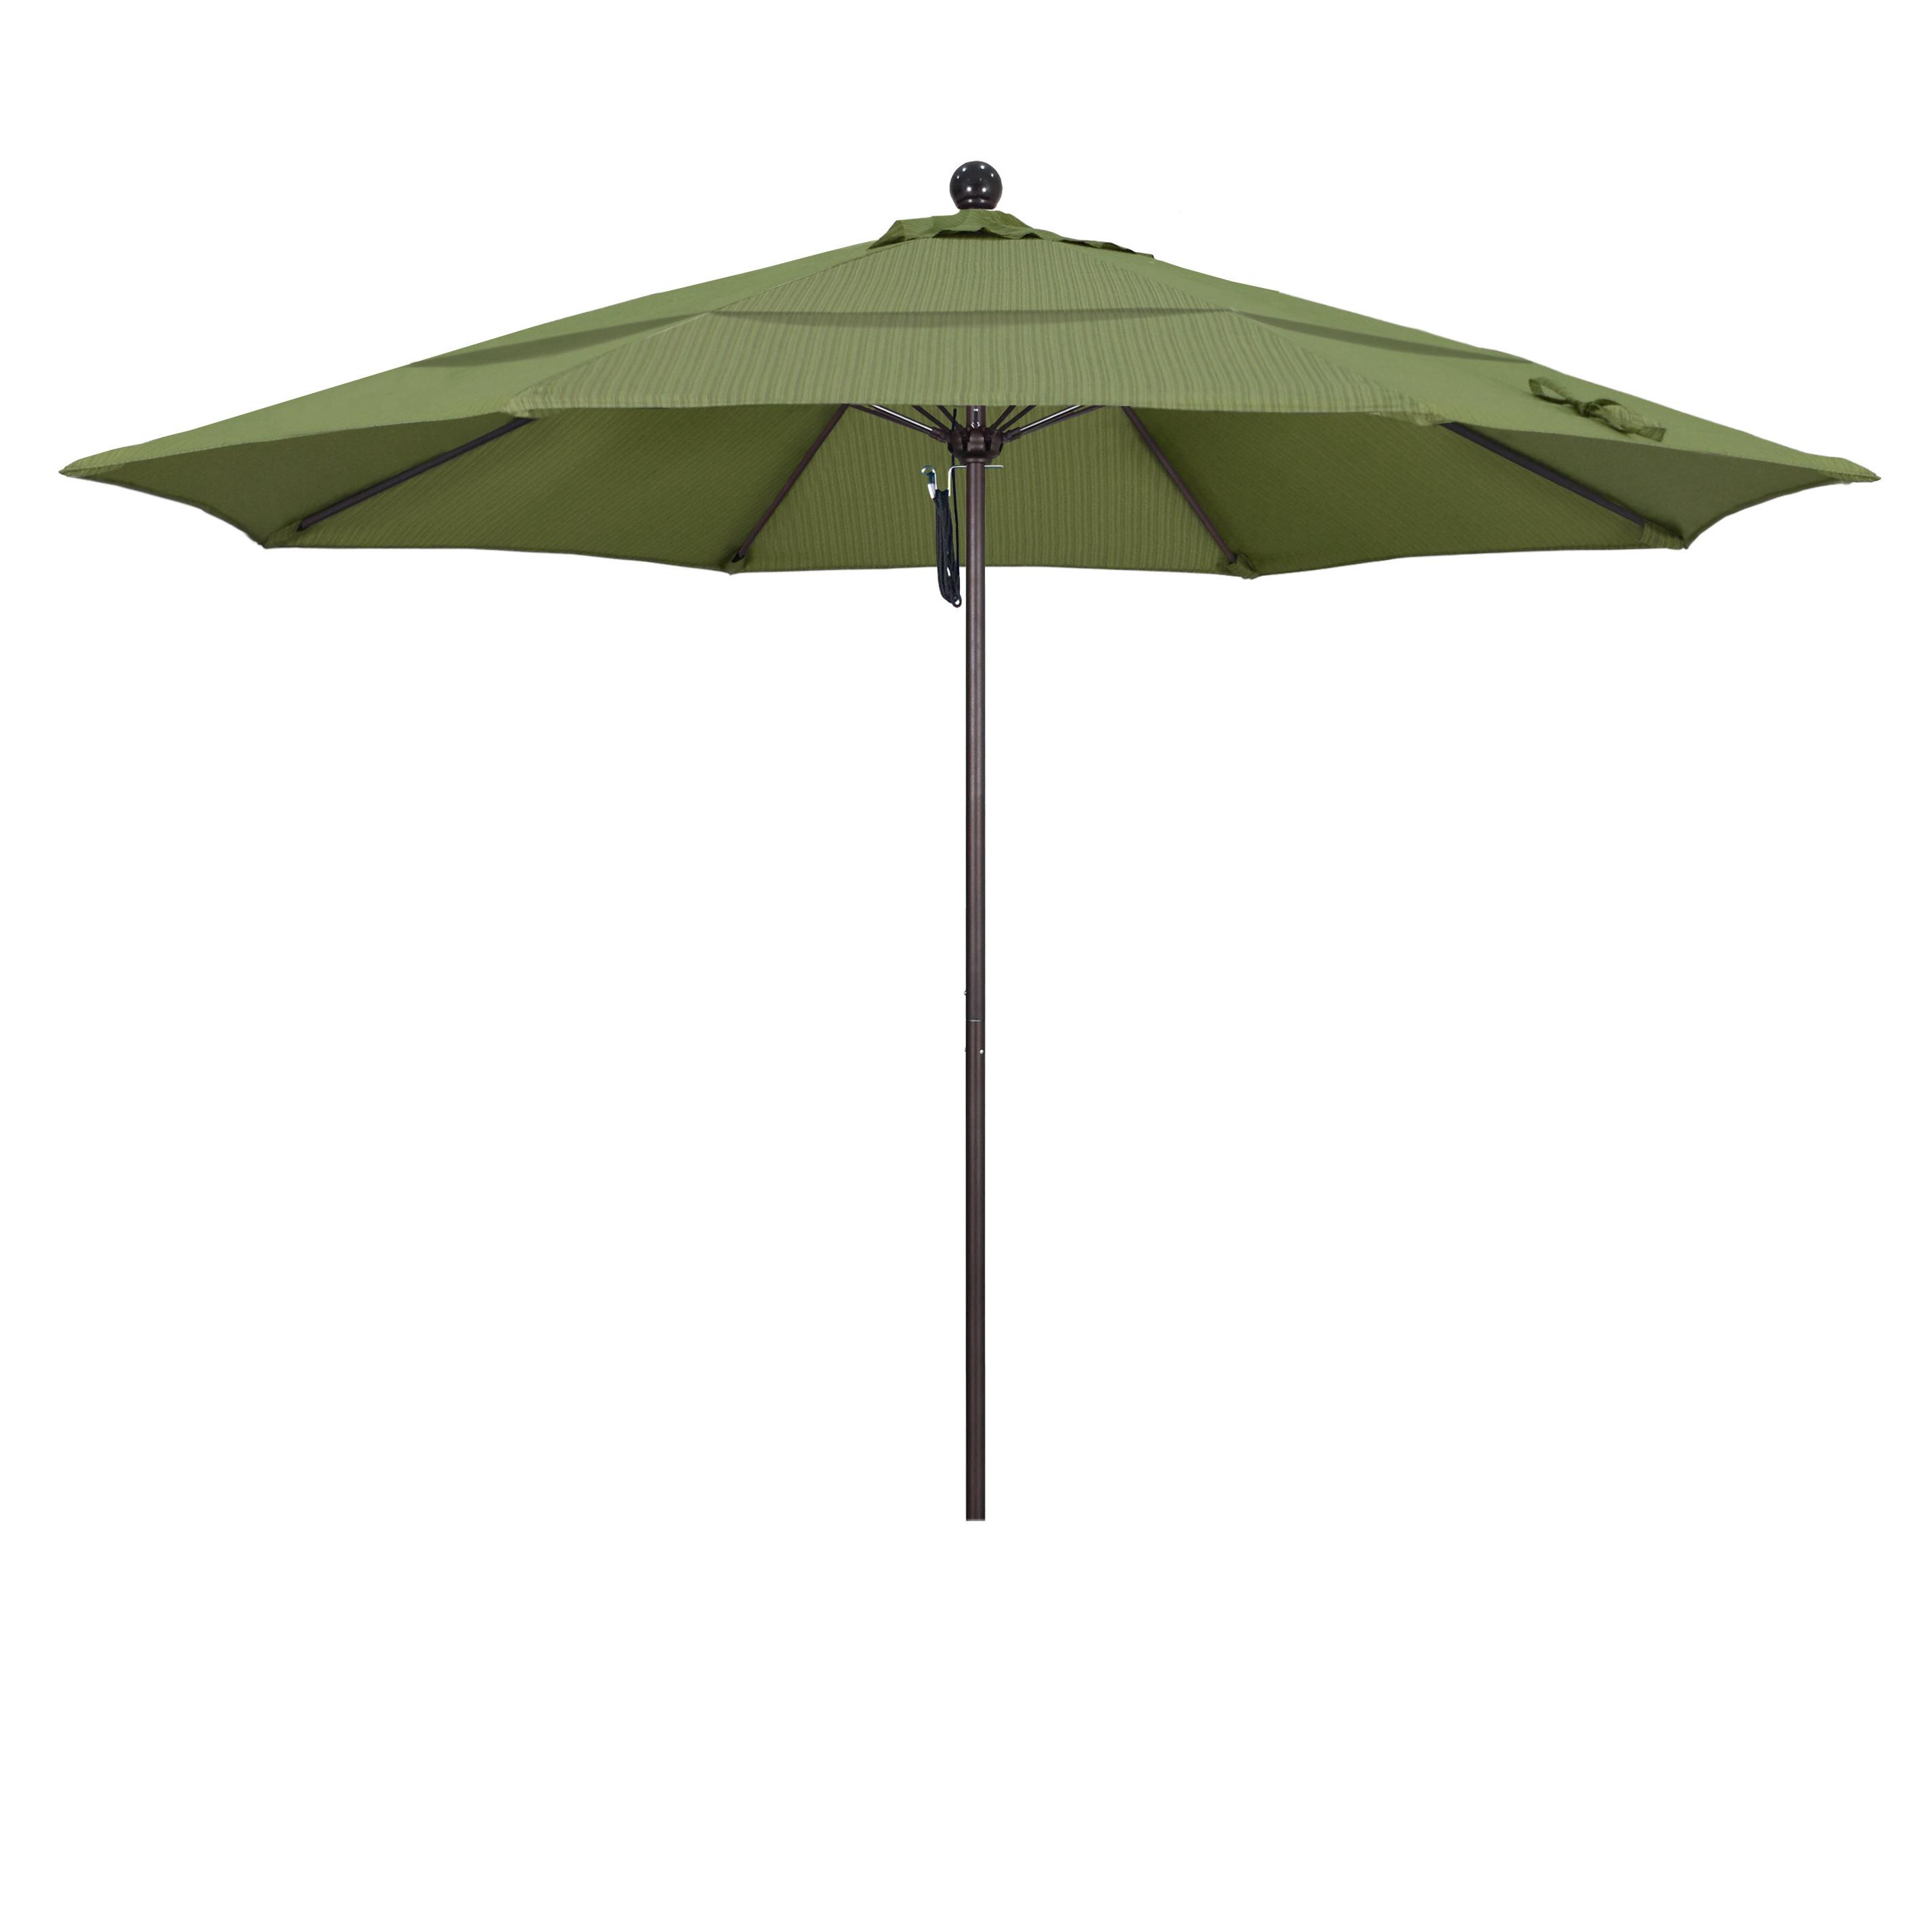 Mucci Madilyn Market Sunbrella Umbrellas Throughout Most Up To Date Benson 11' Market Umbrella (Gallery 5 of 20)